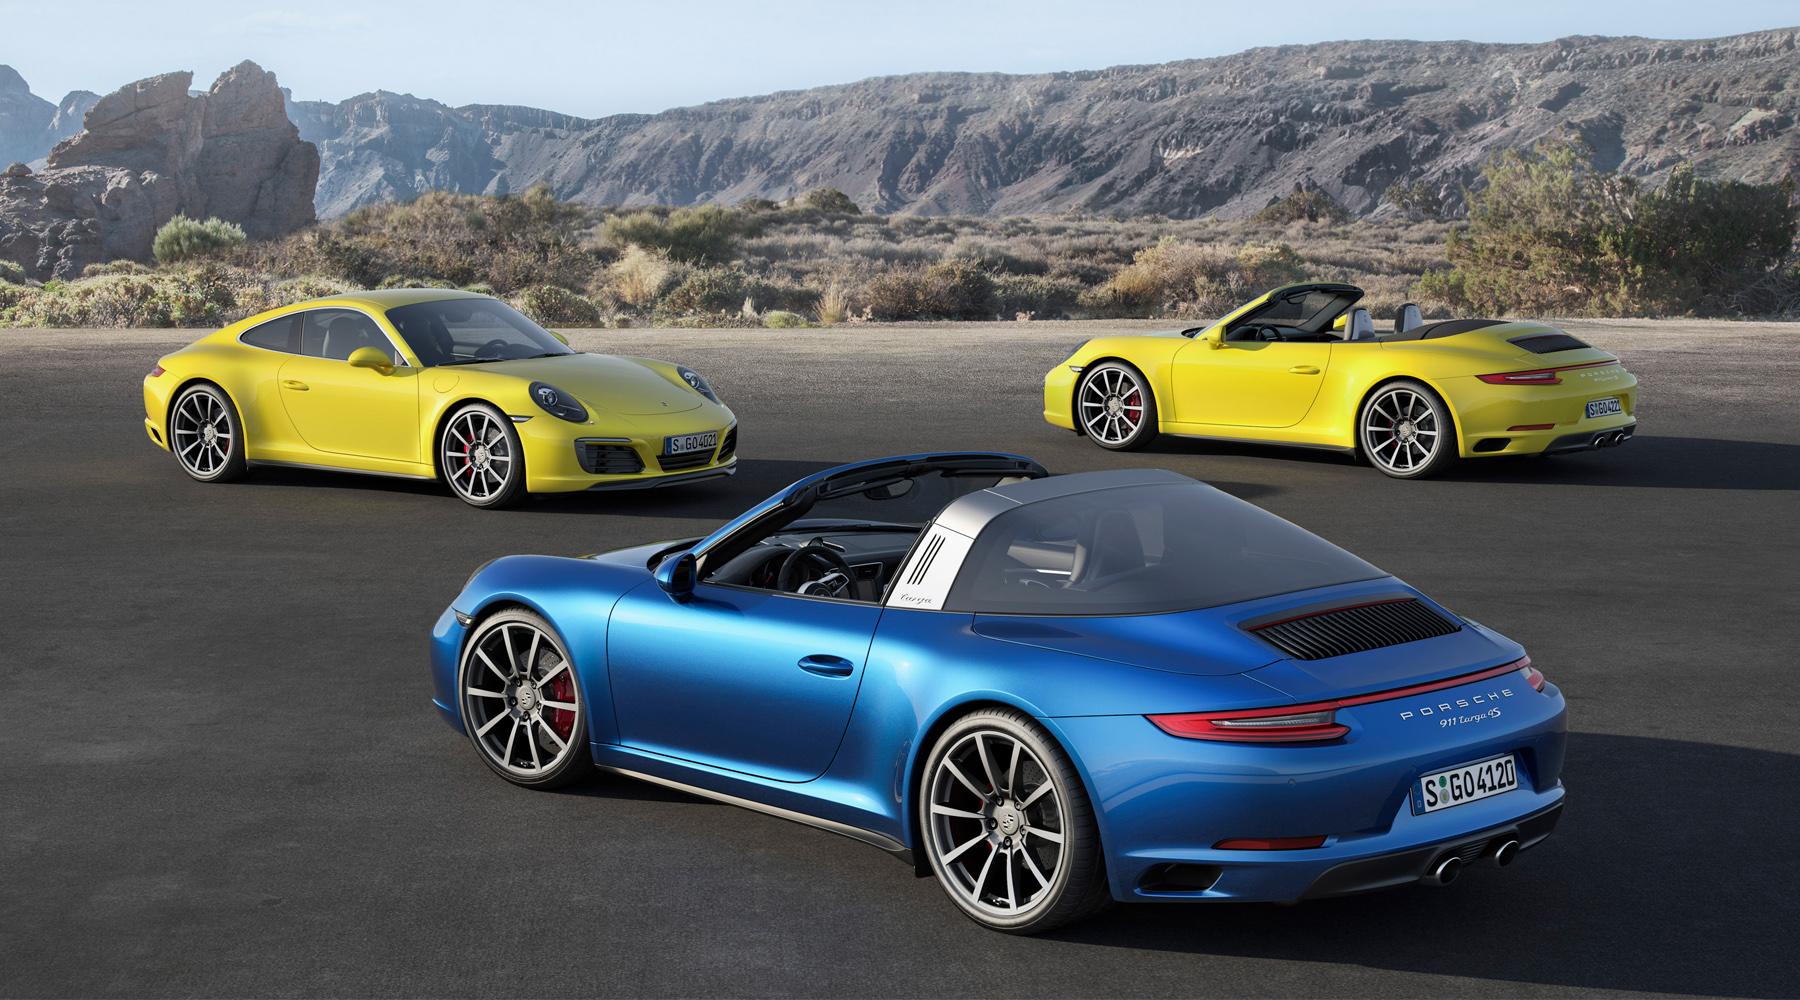 Porsche Carerra 4 (2015)